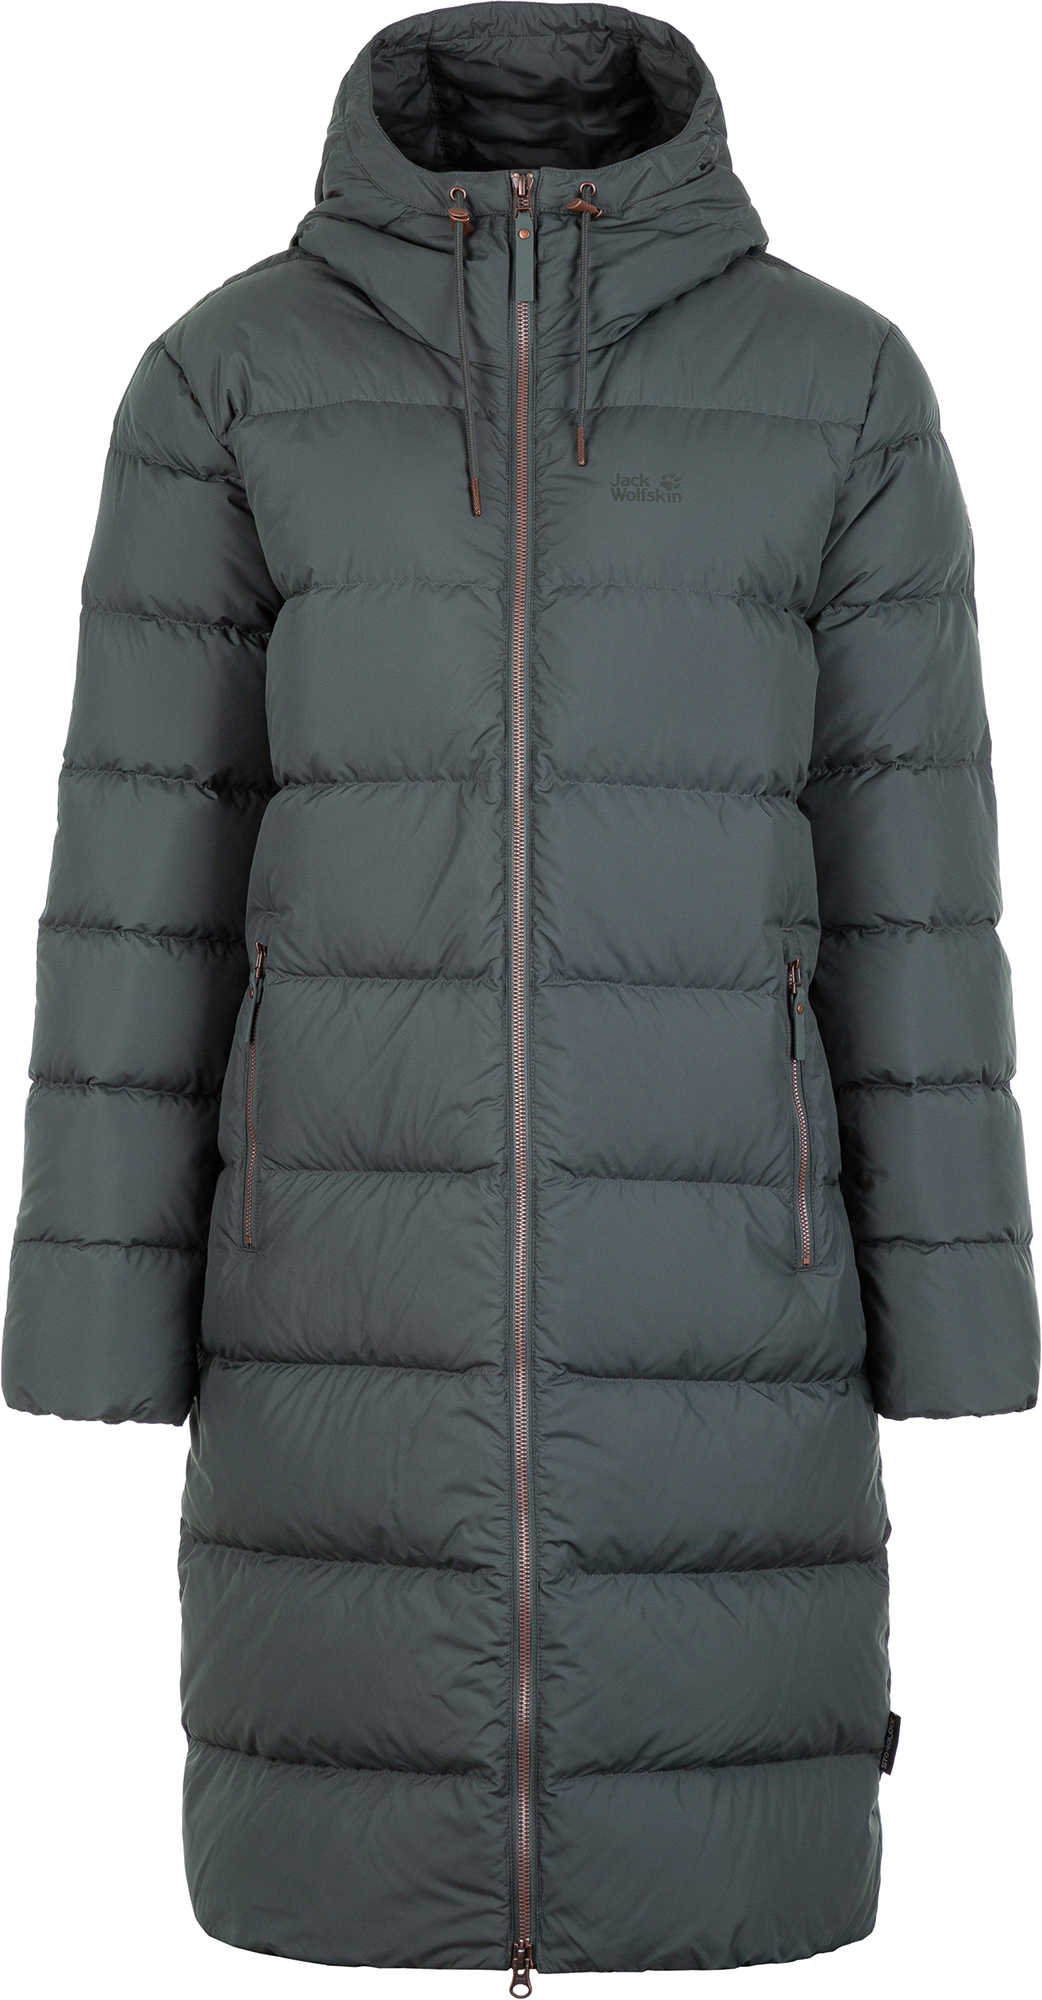 Jack Wolfskin Куртка пуховая женская Crystal Palace, размер 50